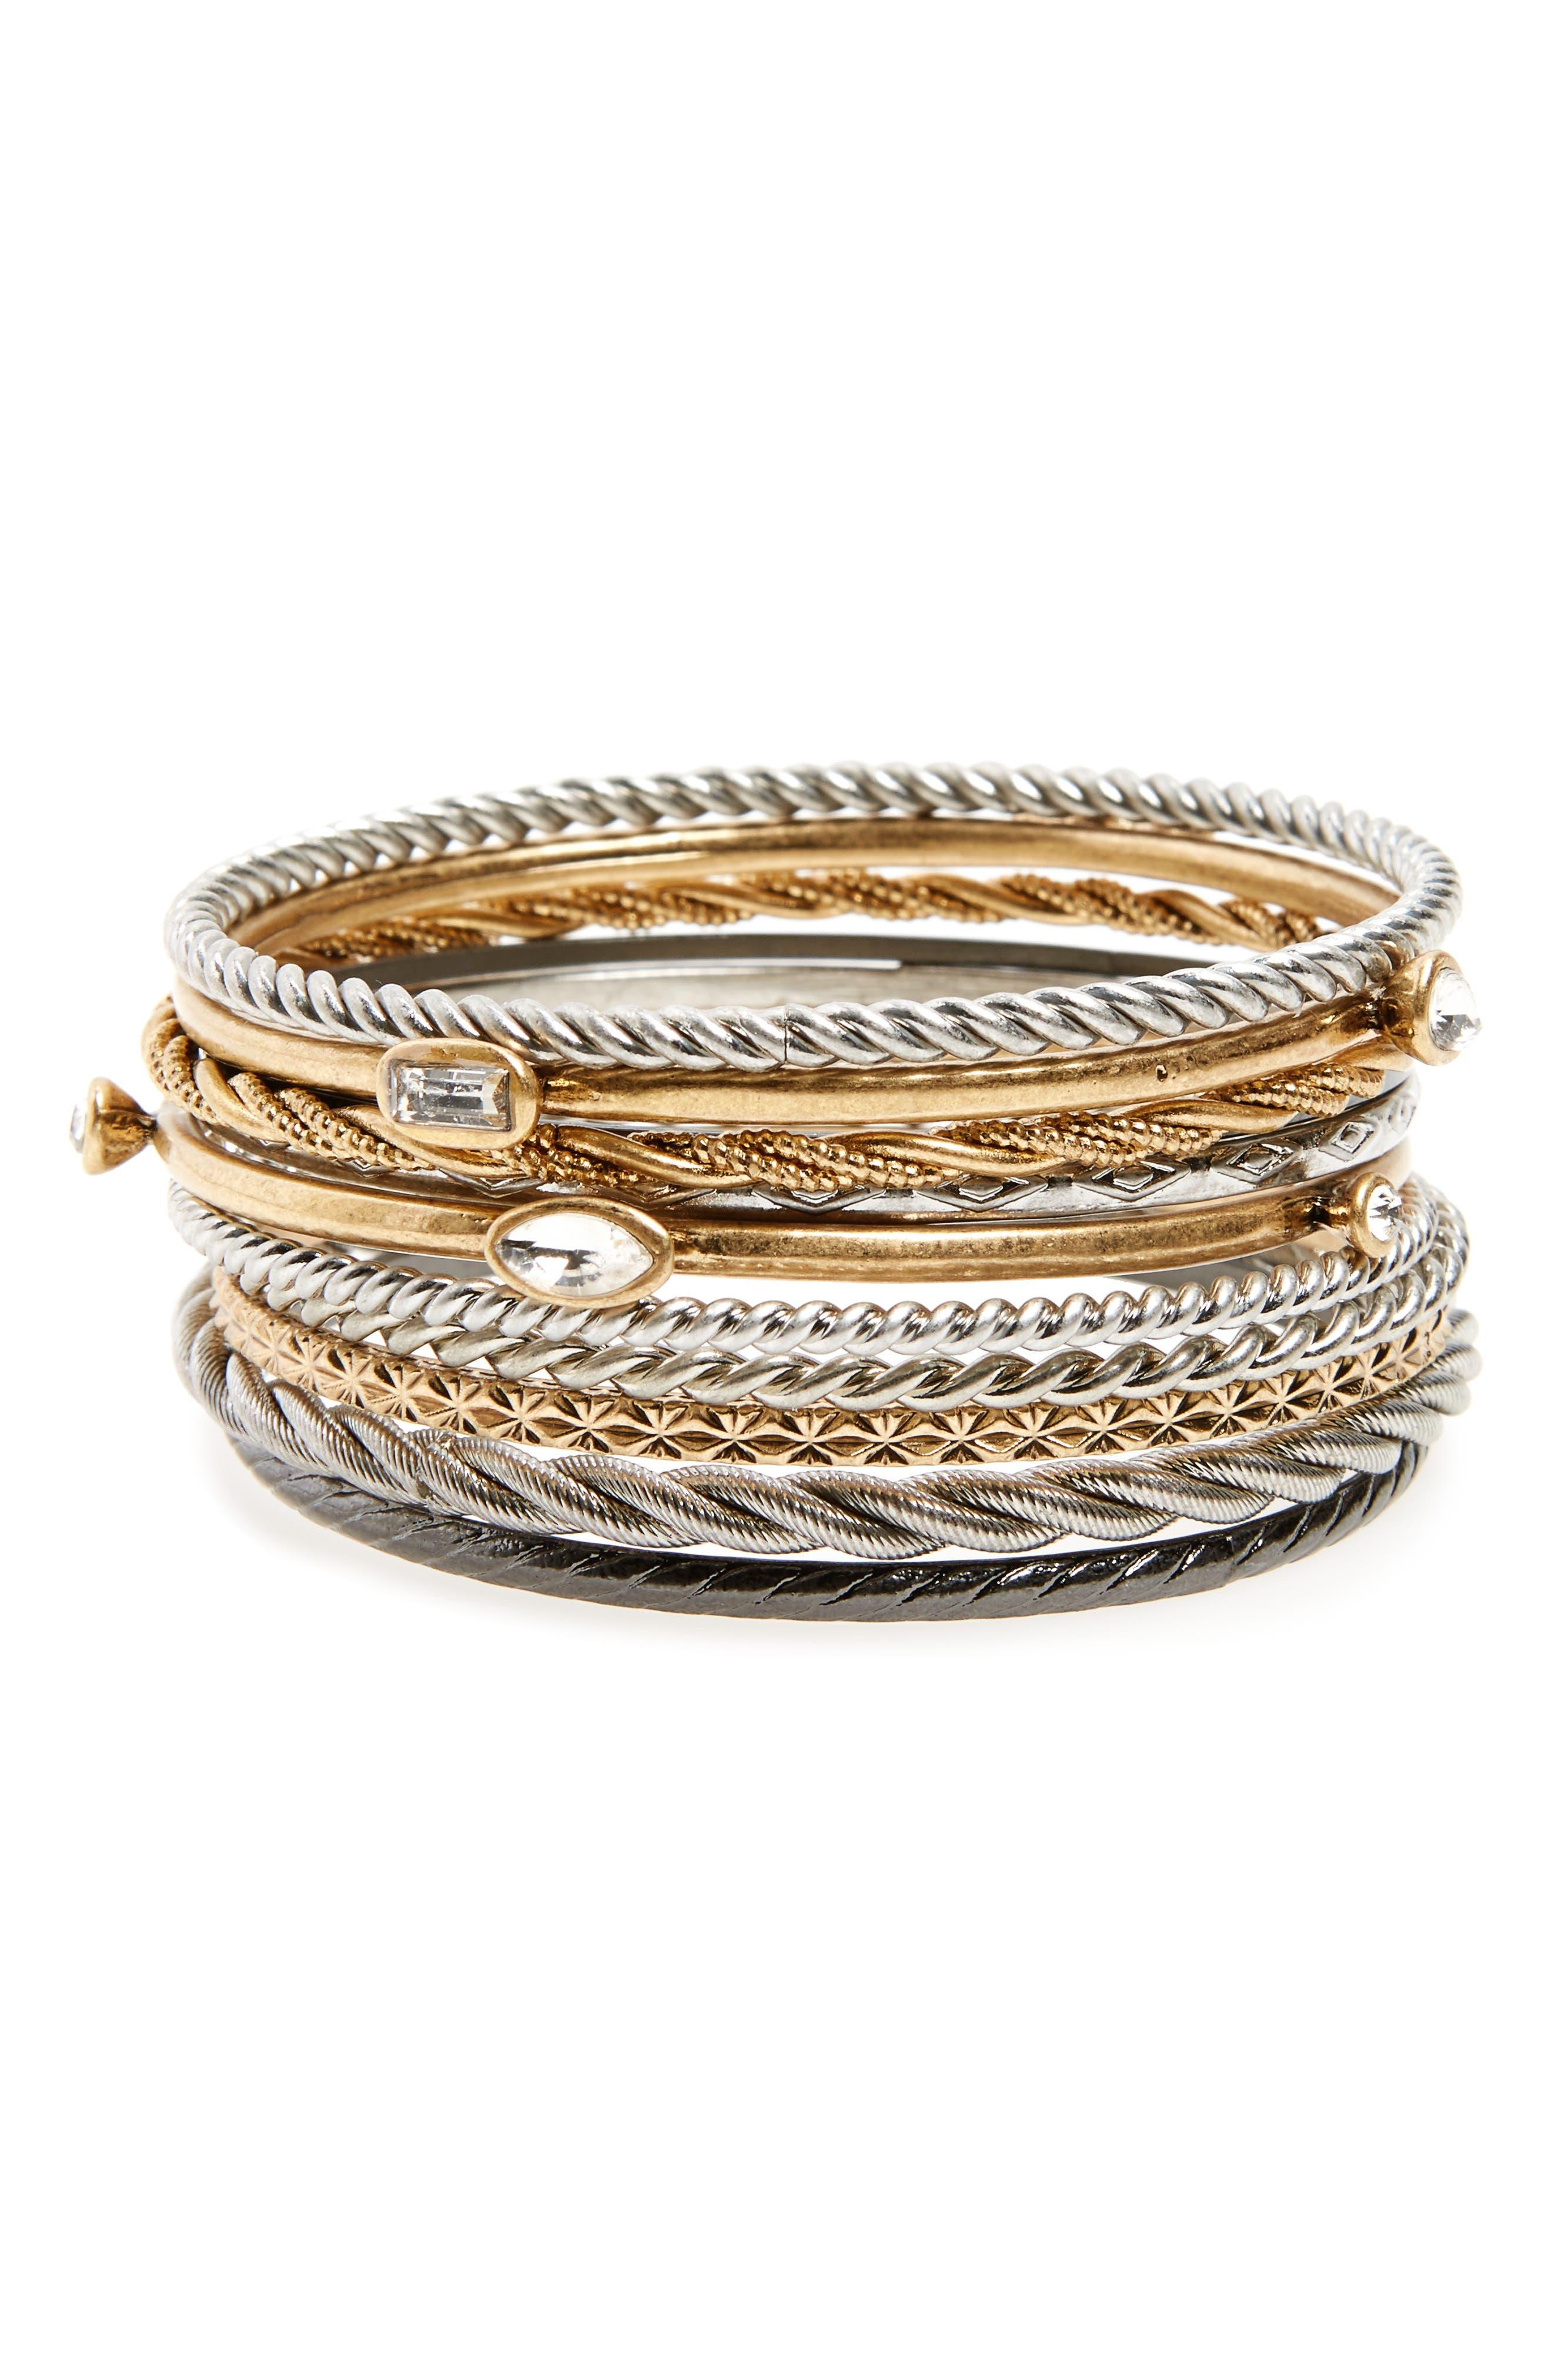 Set of 11 Bangles,                         Main,                         color, Clear- Gold- Rhodium- Hem